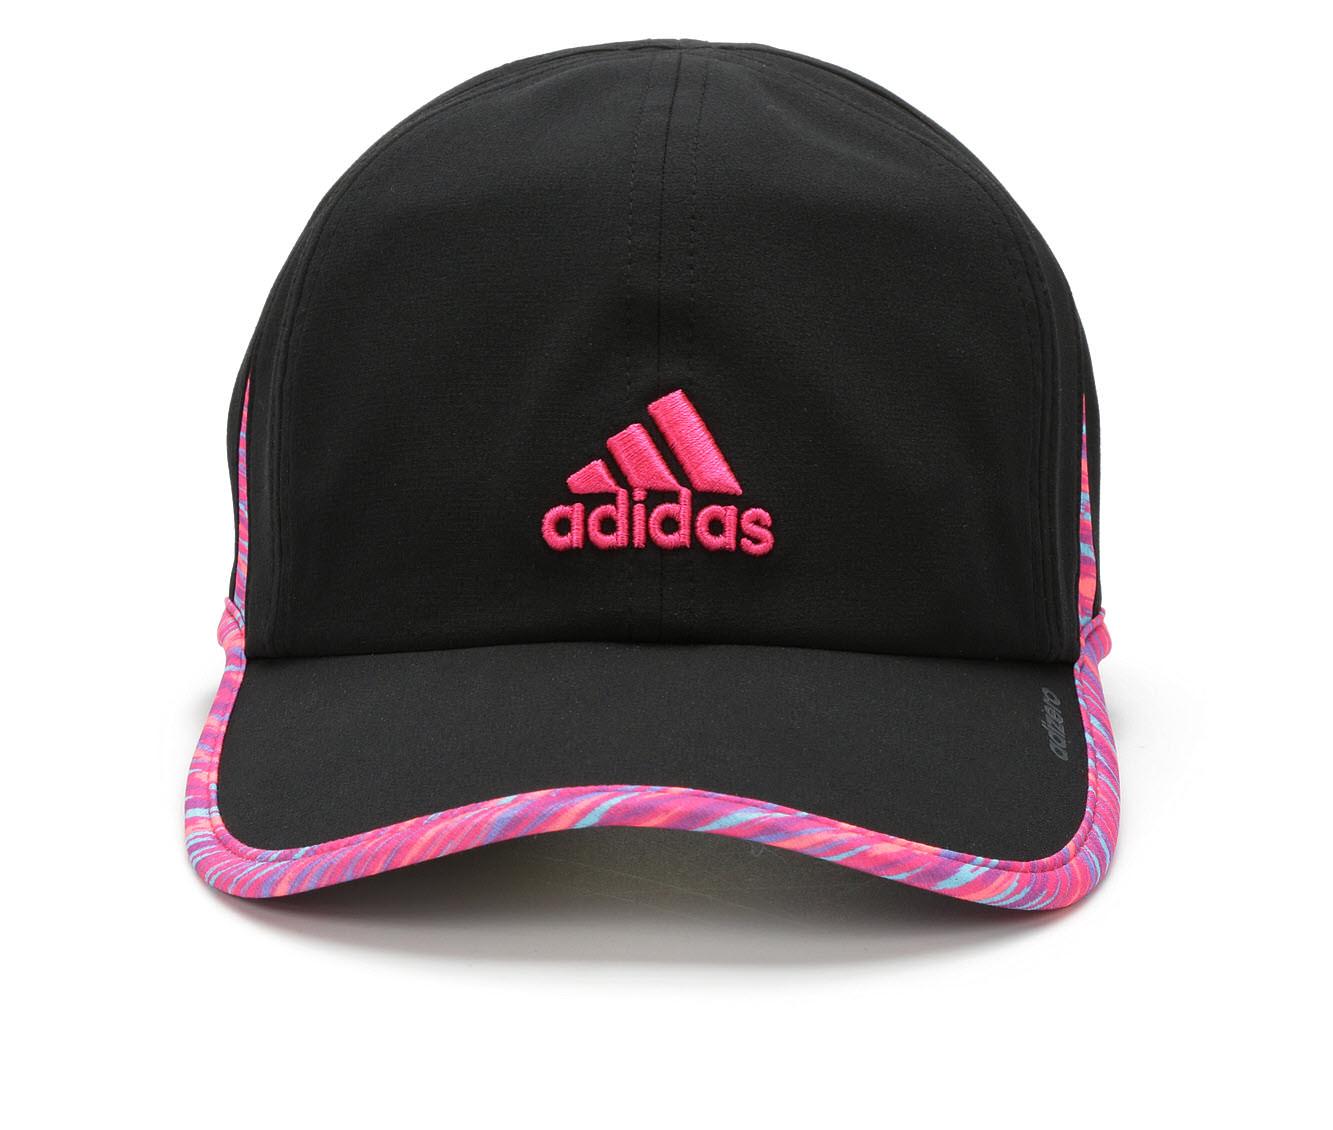 Adidas Adizero II Cap (Black - Size UNSZ) 1659720